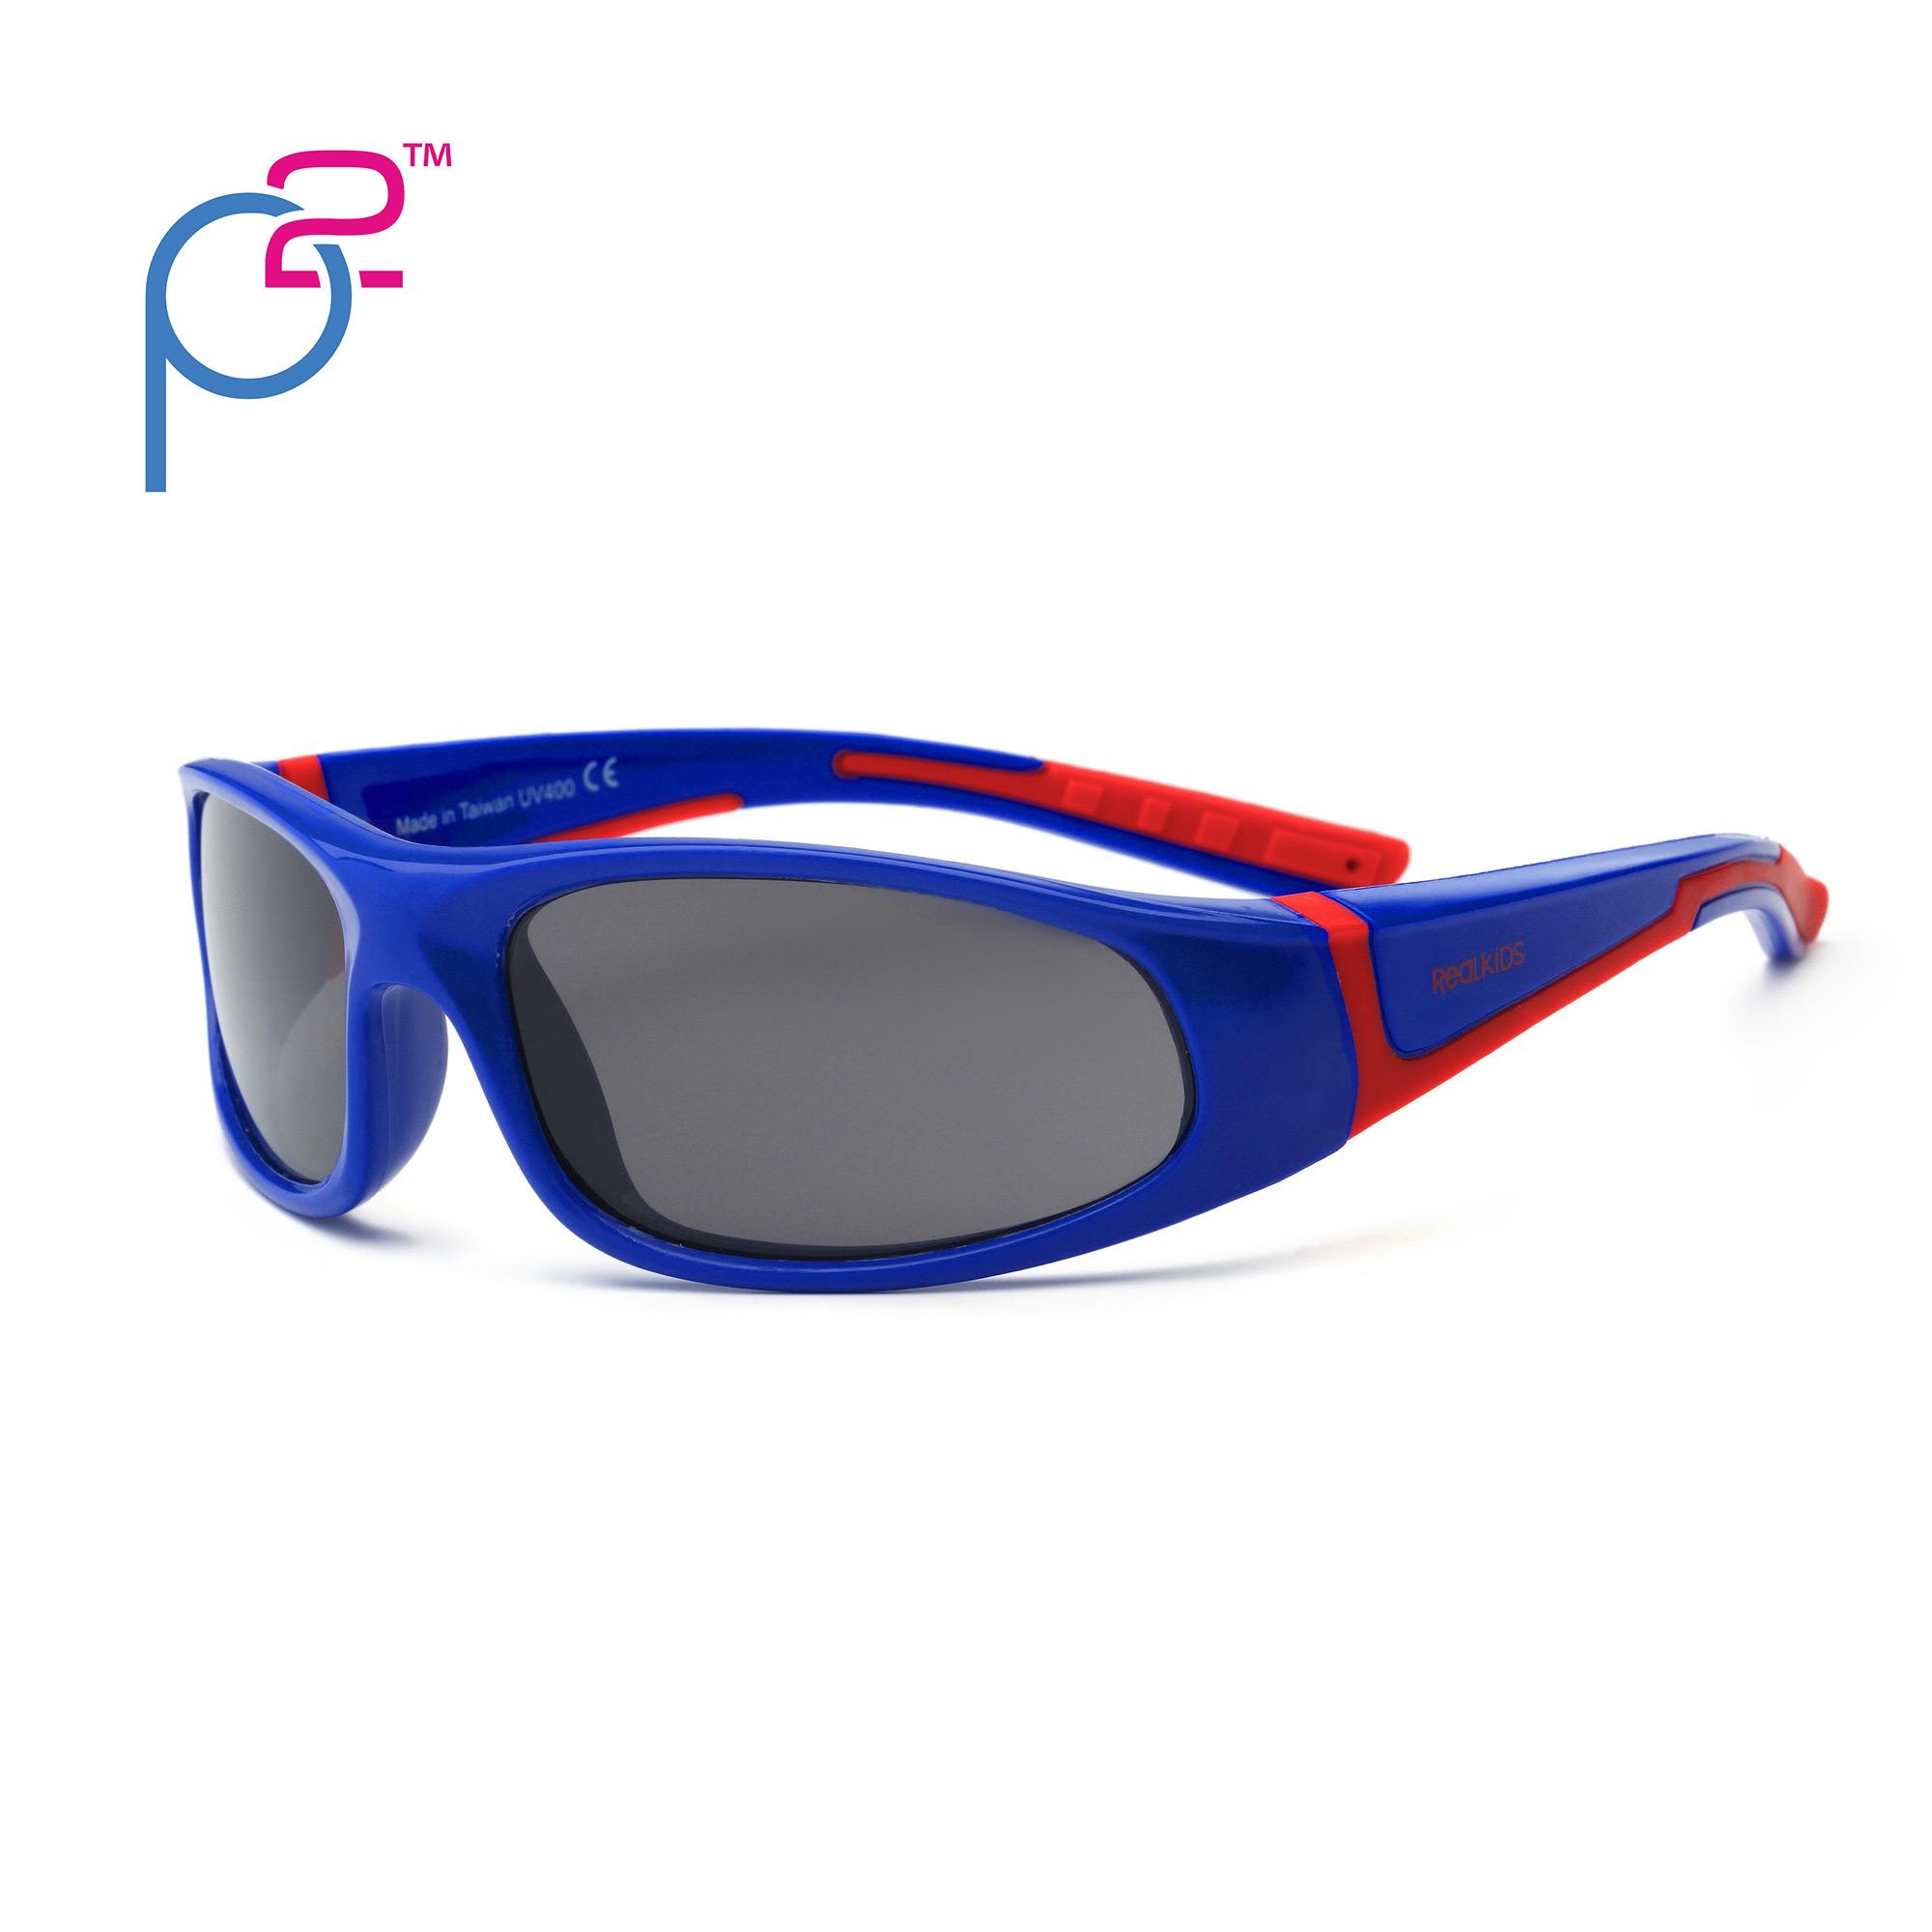 eb5ae0f5978e Bolt Polarized Sunglasses for Youth | Unbreakable Sunglasses | Real ...